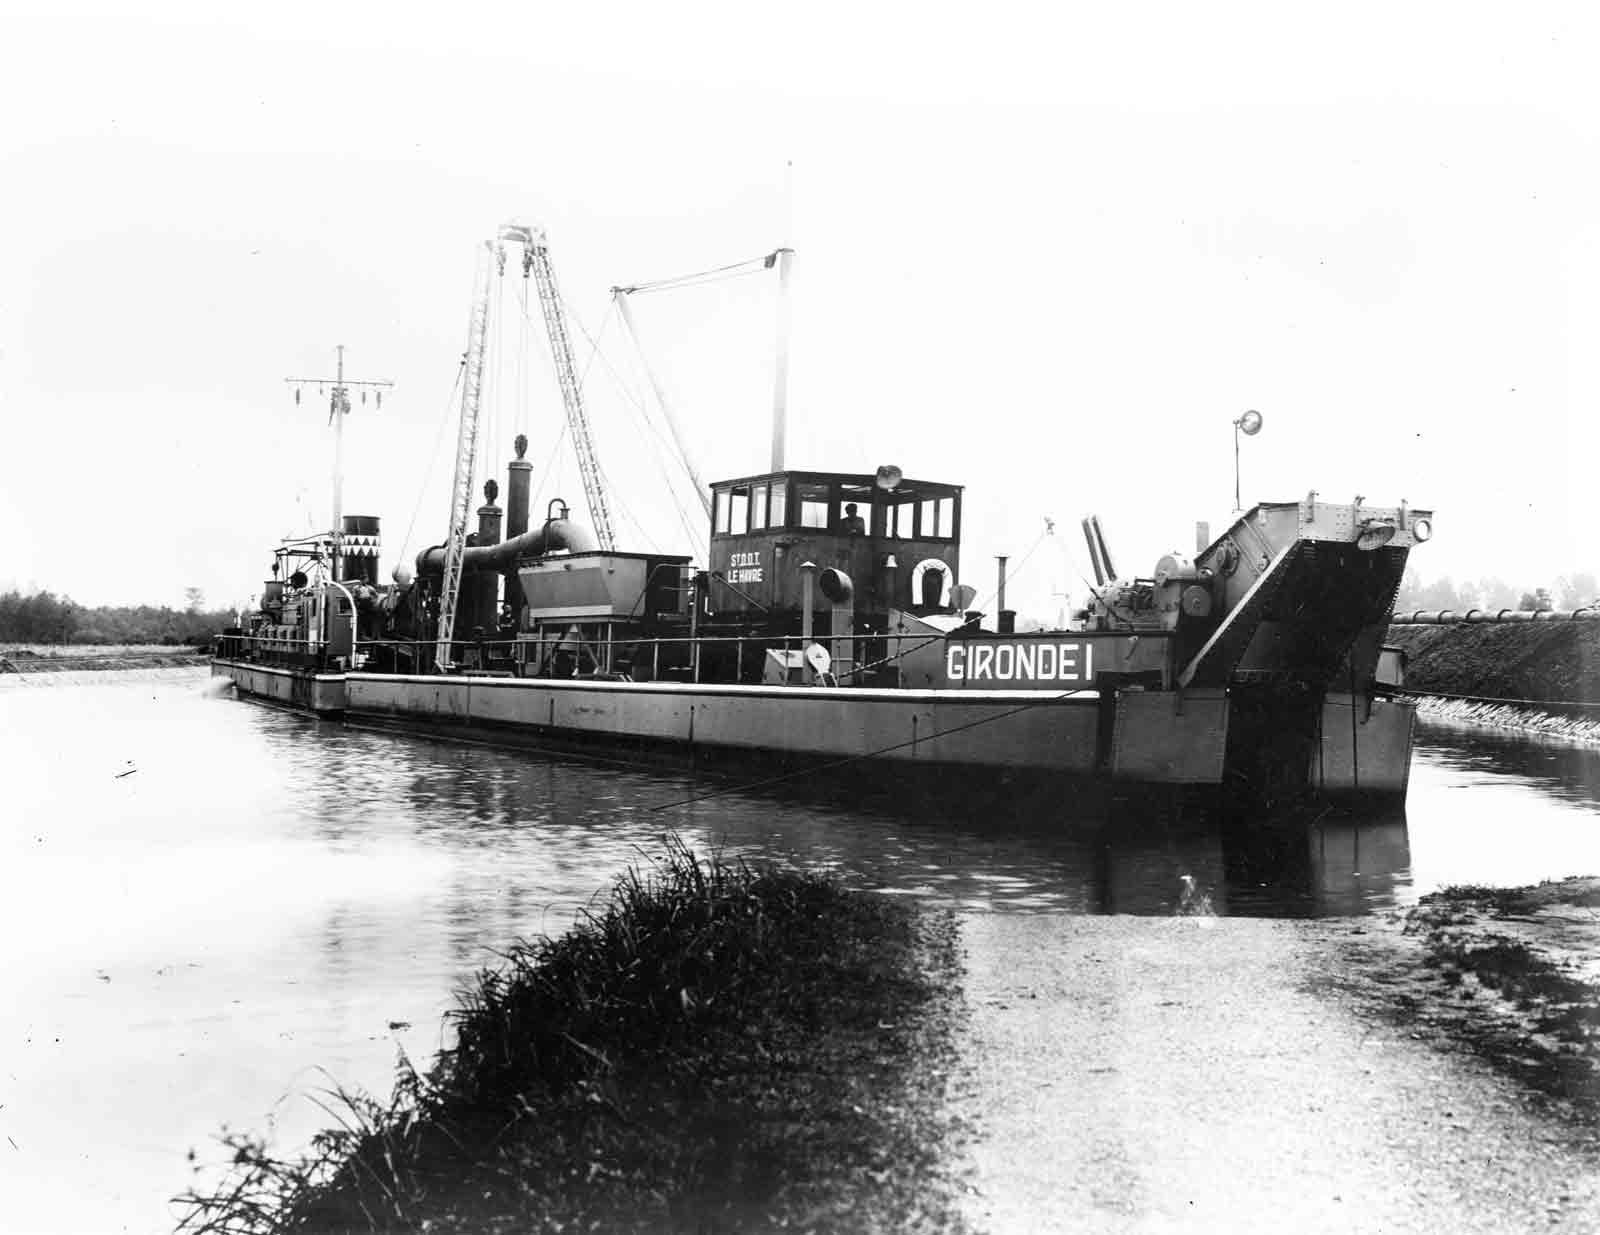 Bnr. 701: Gironde I II (1936)